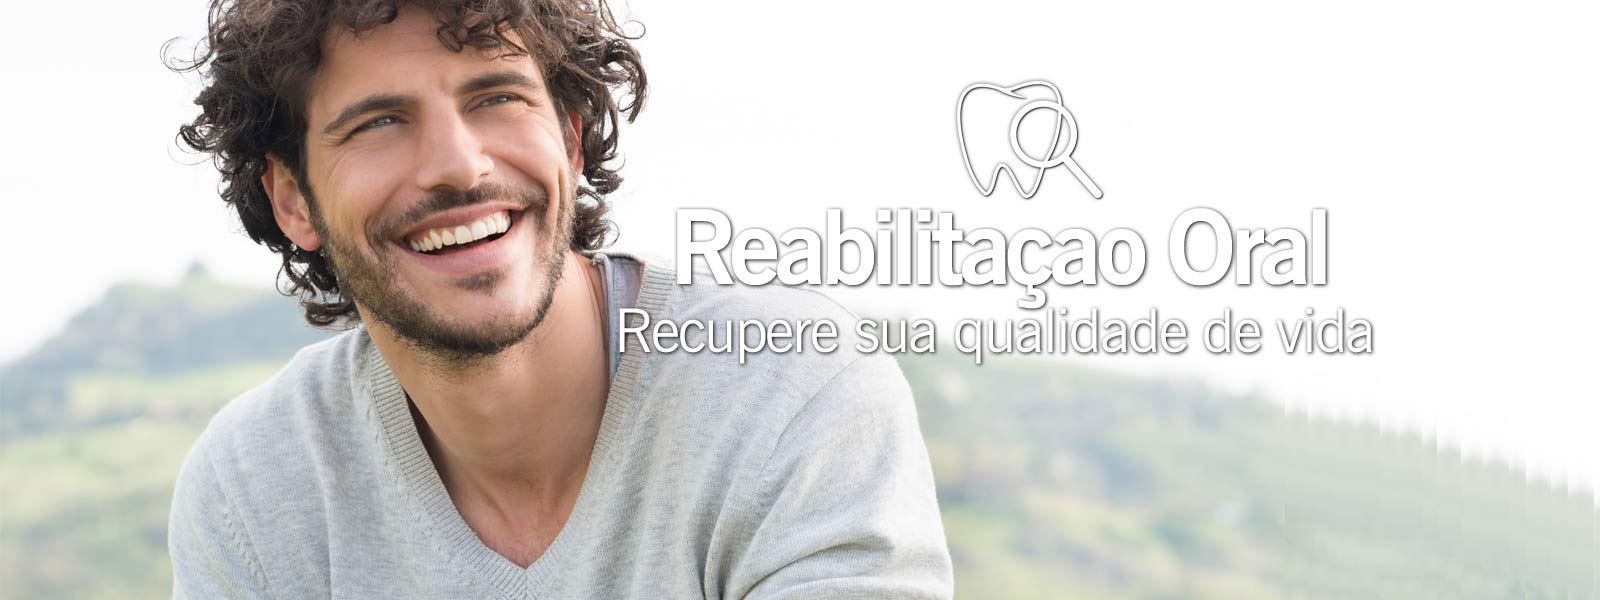 slide3-reabilitacao-oral